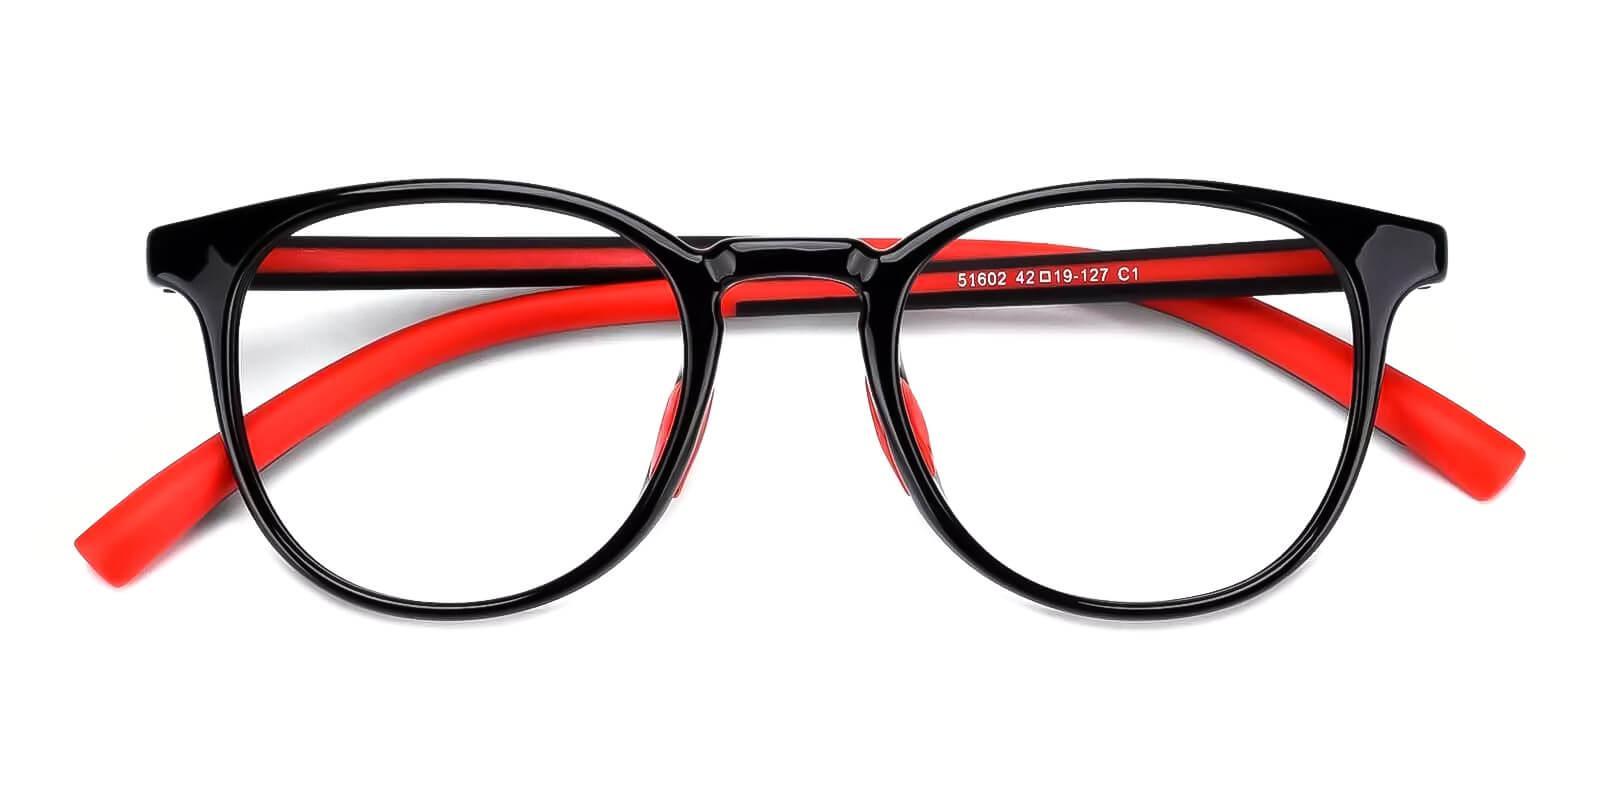 Kids-Experience Red Plastic Eyeglasses , Fashion , UniversalBridgeFit Frames from ABBE Glasses